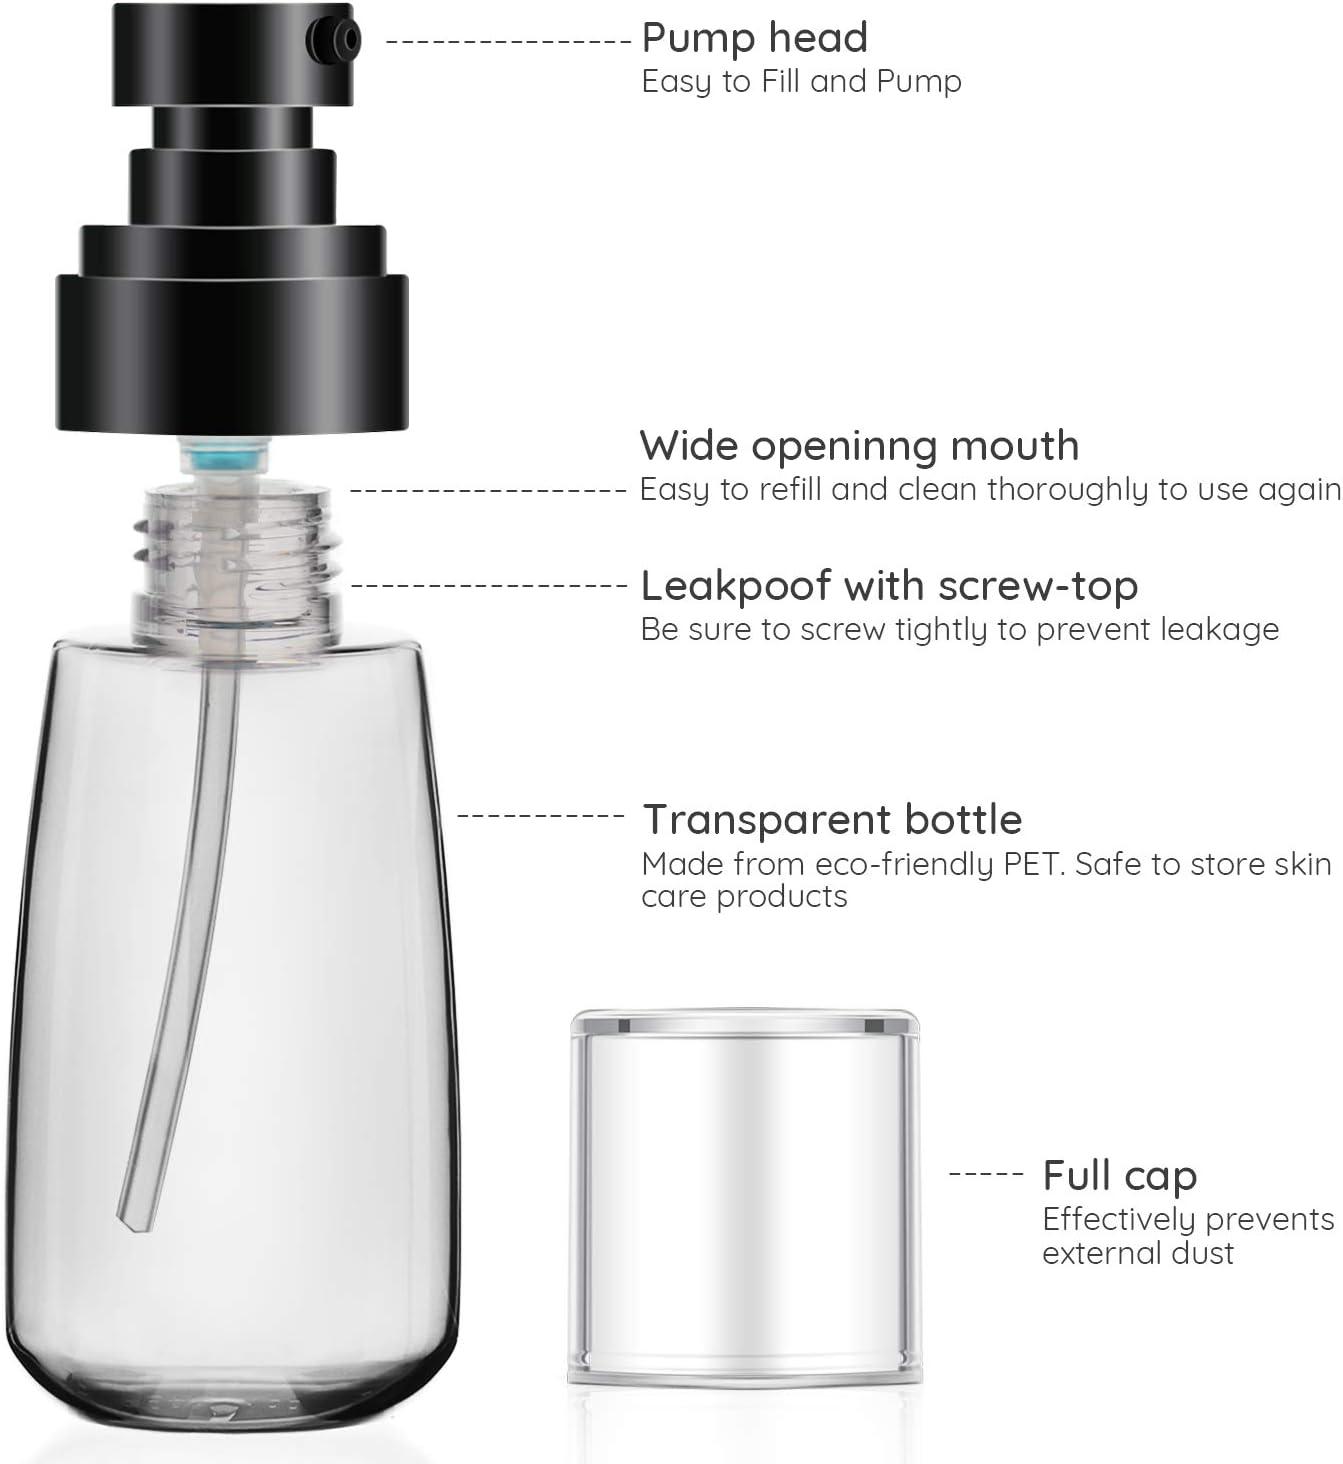 Segbeauty 60ml Dispensador transparente Juego de botellas Port/átil para Esencia Champ/ú Acondicionador Recipientes de bomba prensados recargables Botella de loci/ón de 3 piezas